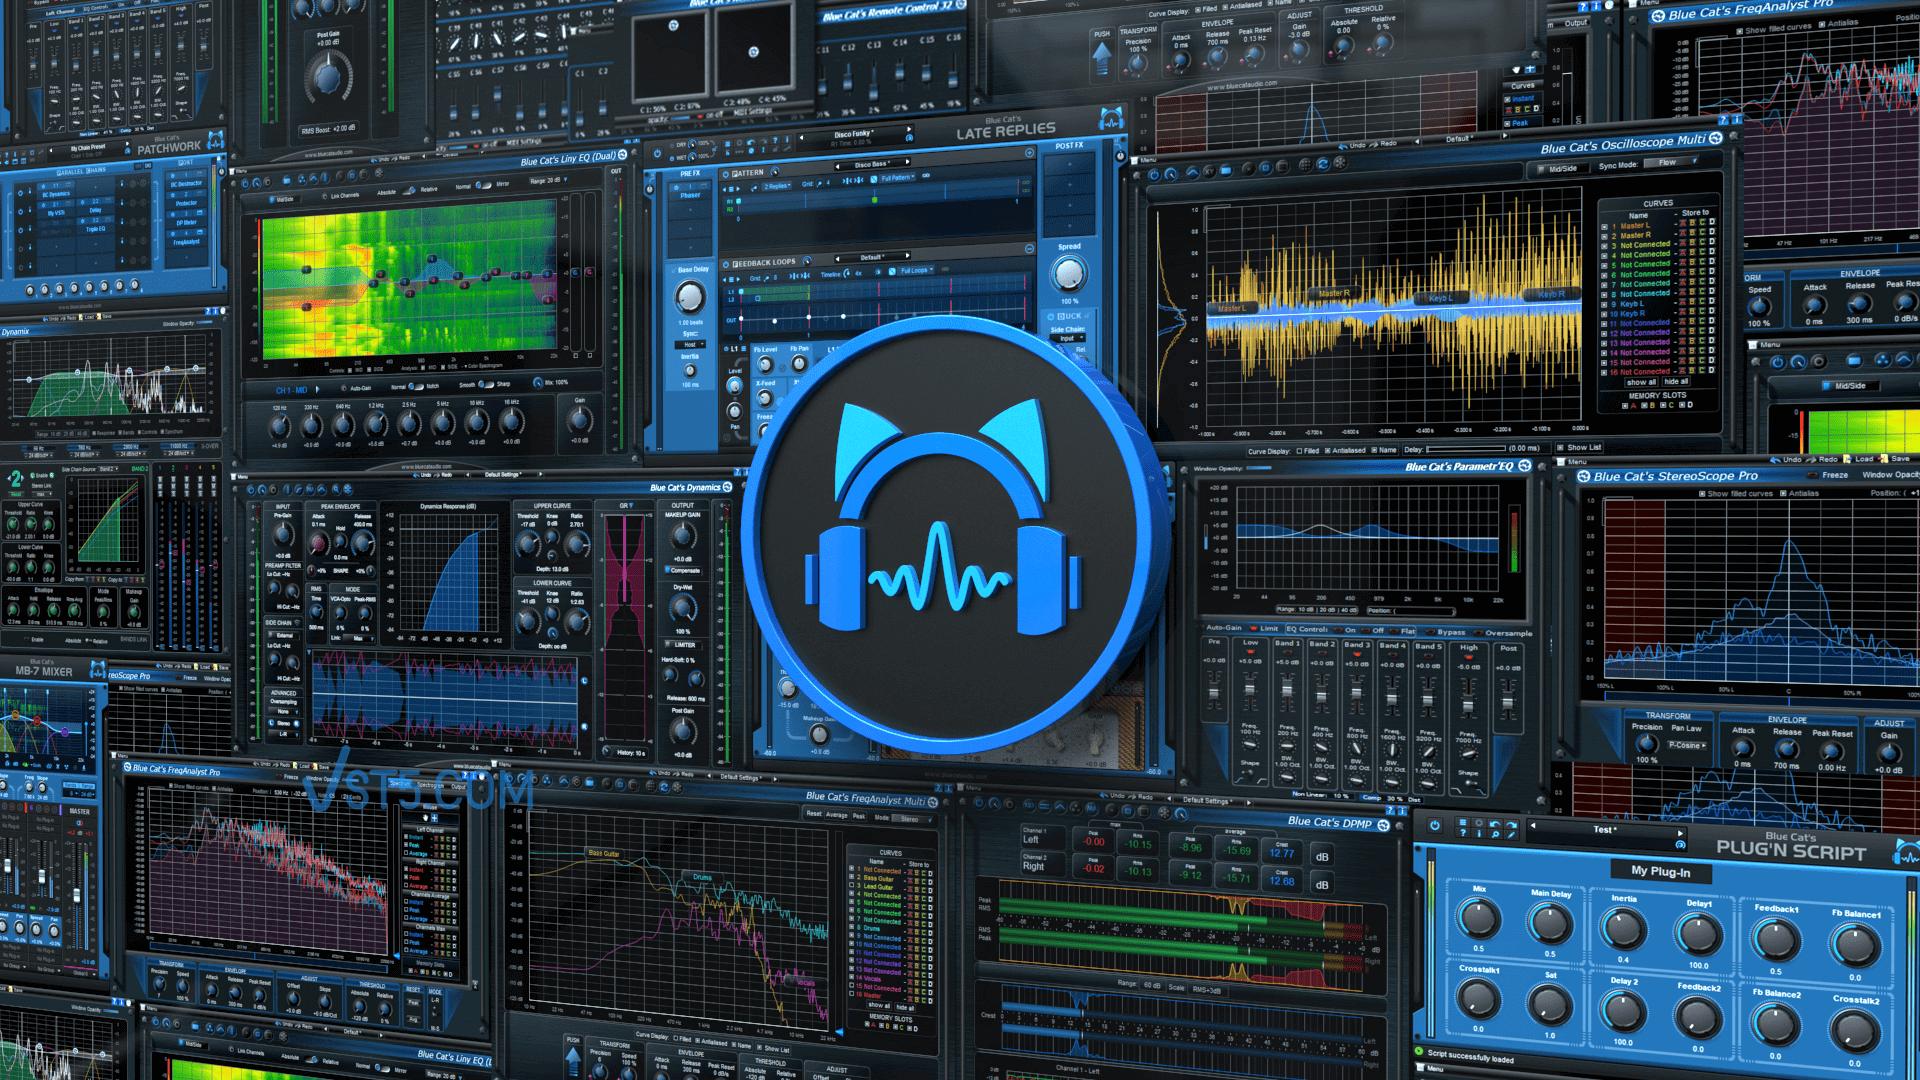 Blue Cat's All Plug-Ins Pack 2020.10 CE-V.R 蓝猫插件套装插图